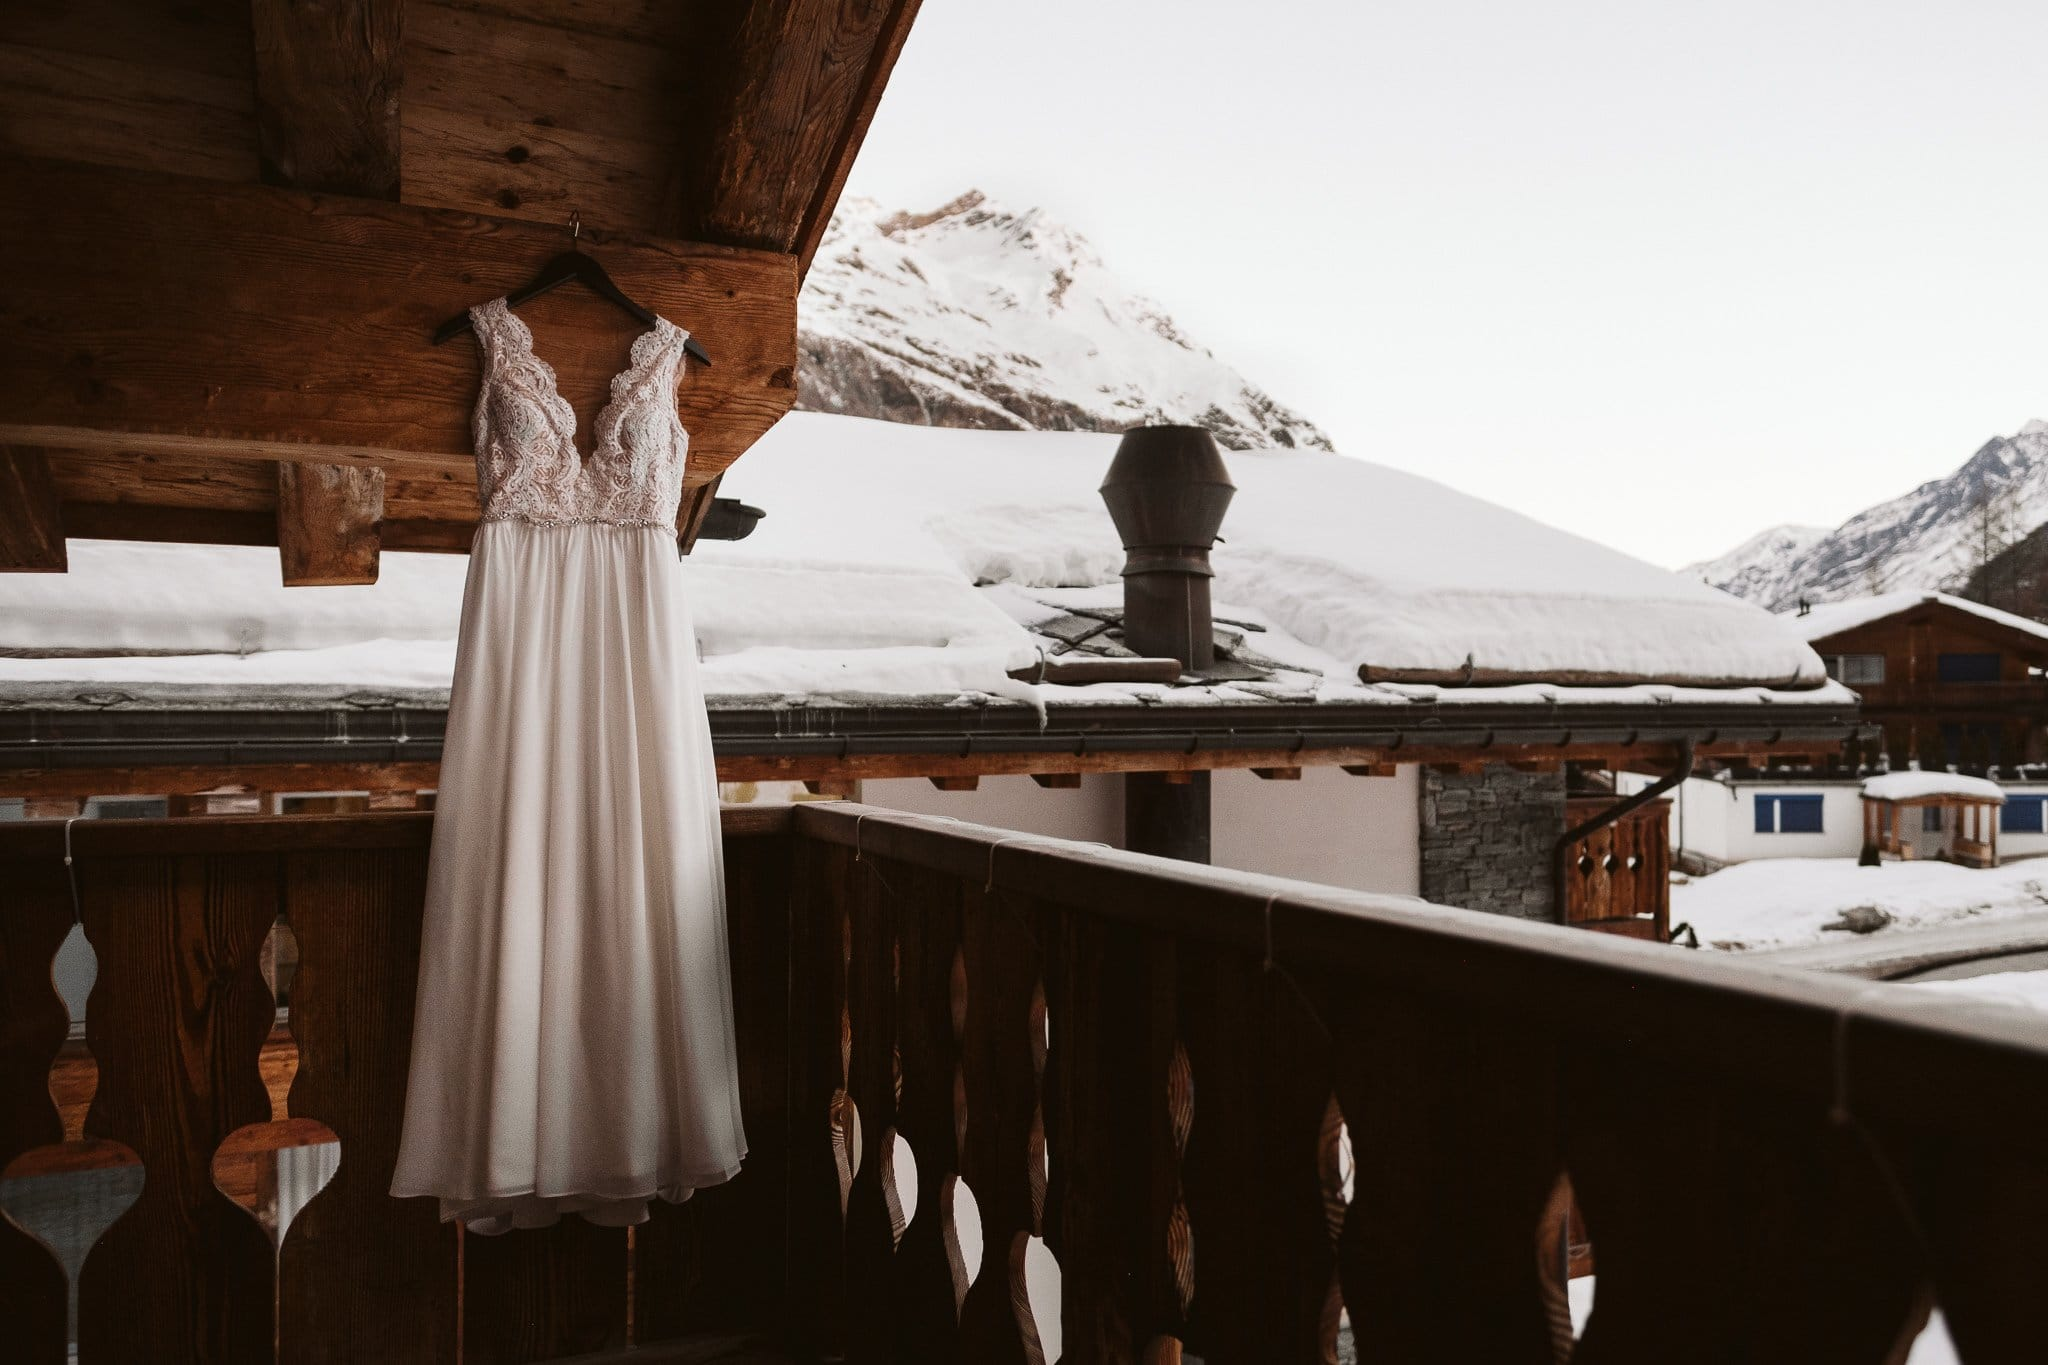 Wedding dress hanging on balcony of traditional Swiss hotel. Matterhorn elopement in Switzerland.